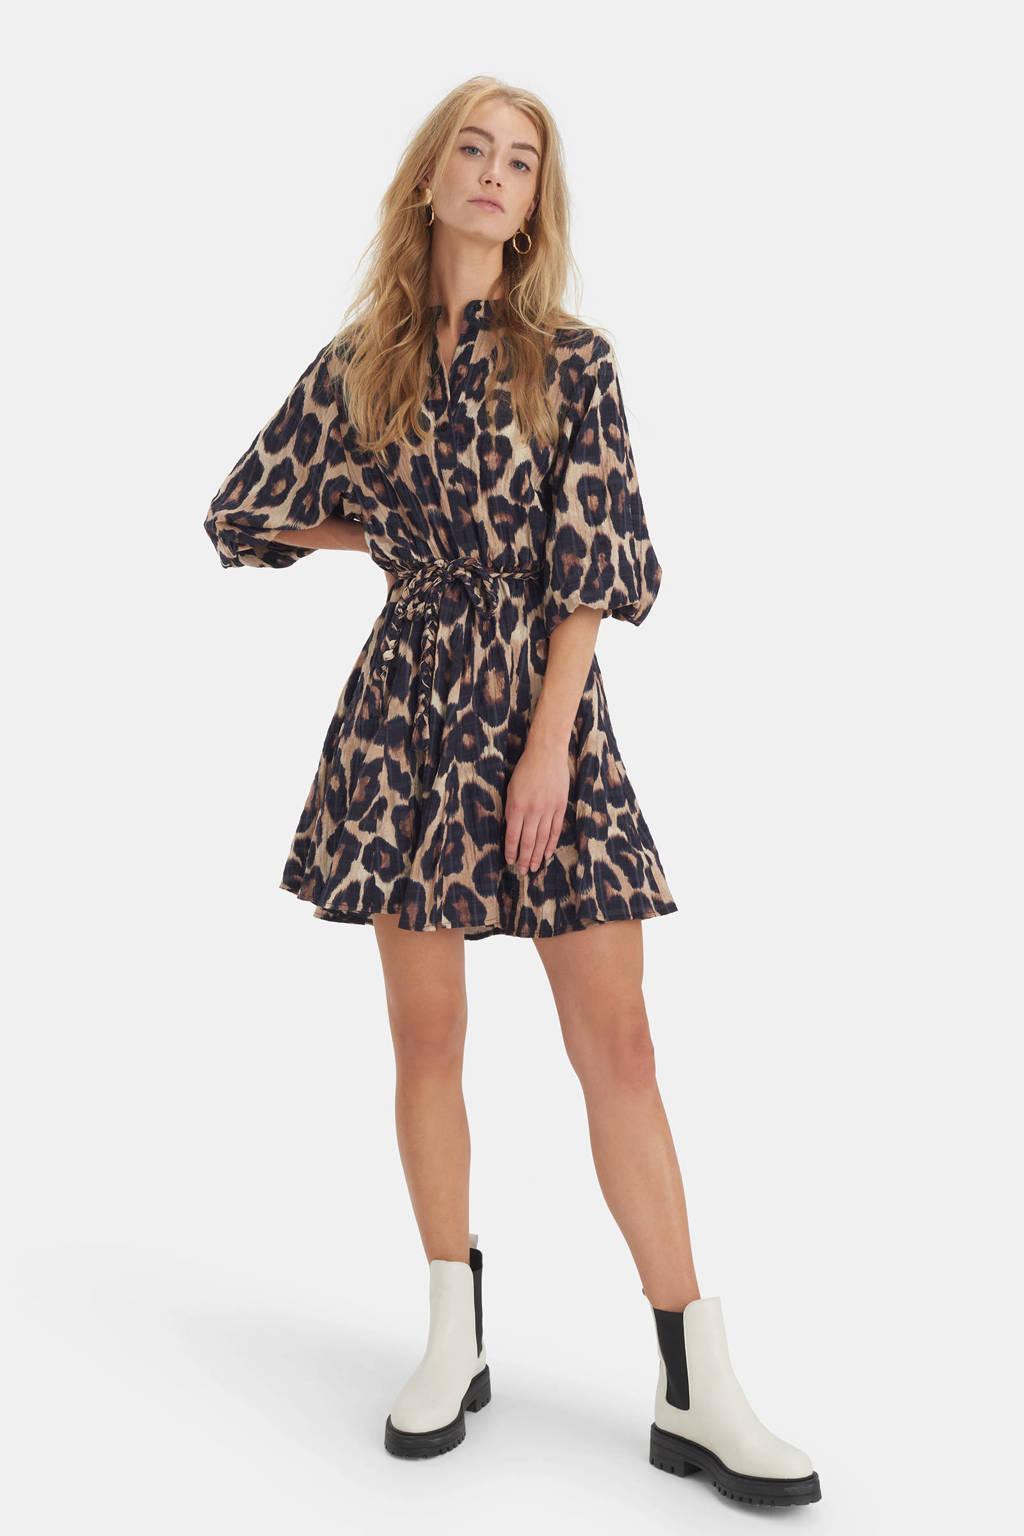 Shoeby Eksept jurk Bowie Leopard met panterprint en plooien bruin/zwart, Bruin/zwart